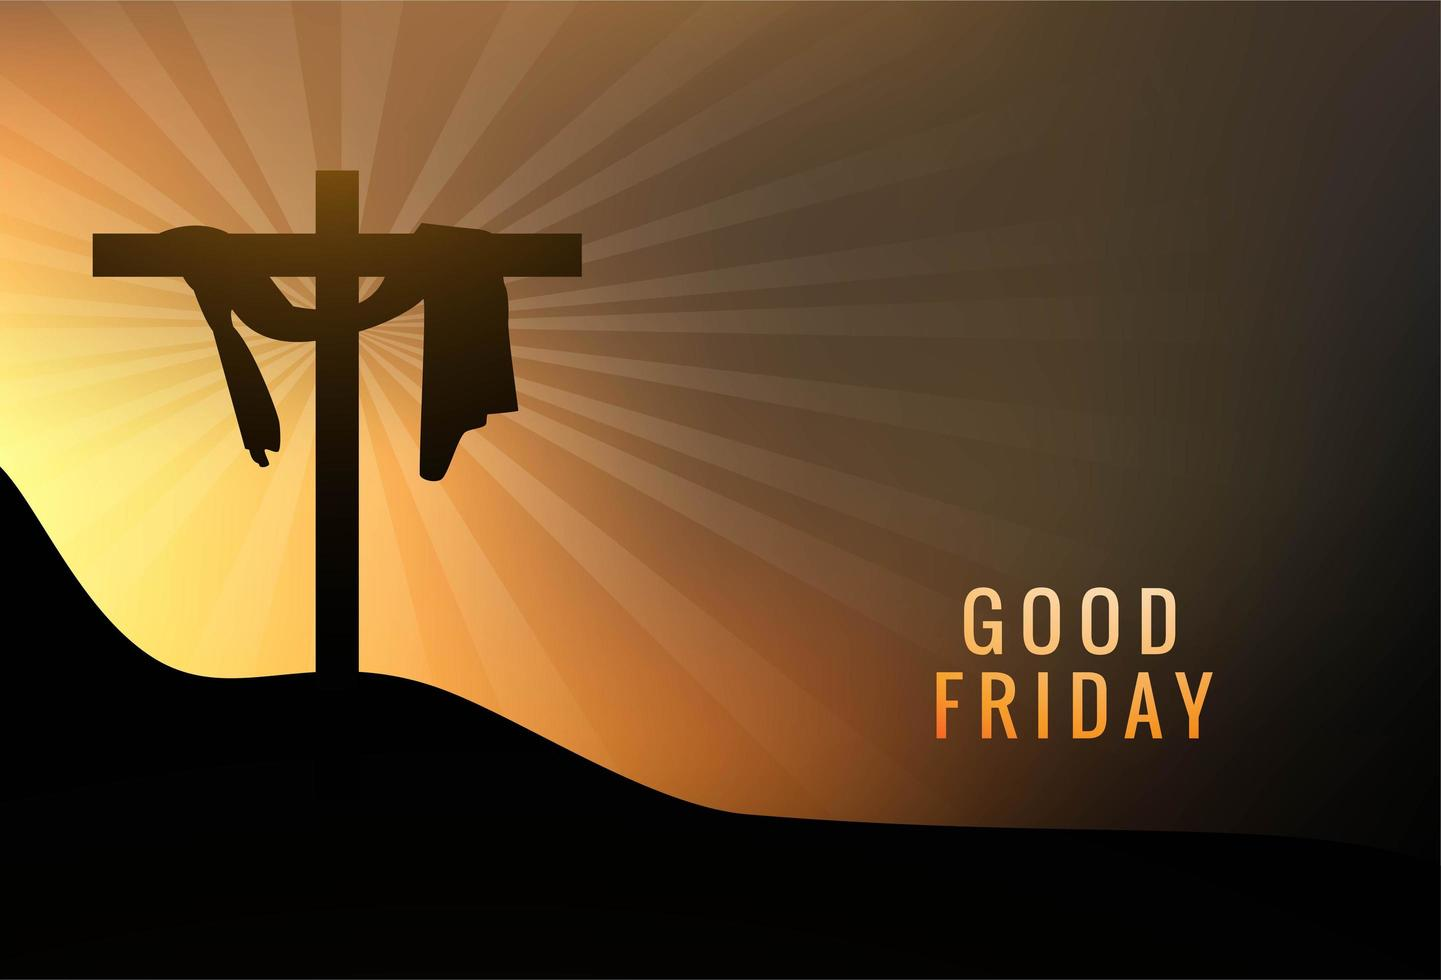 Good Friday Jesus on Cross on Sunset Background vector